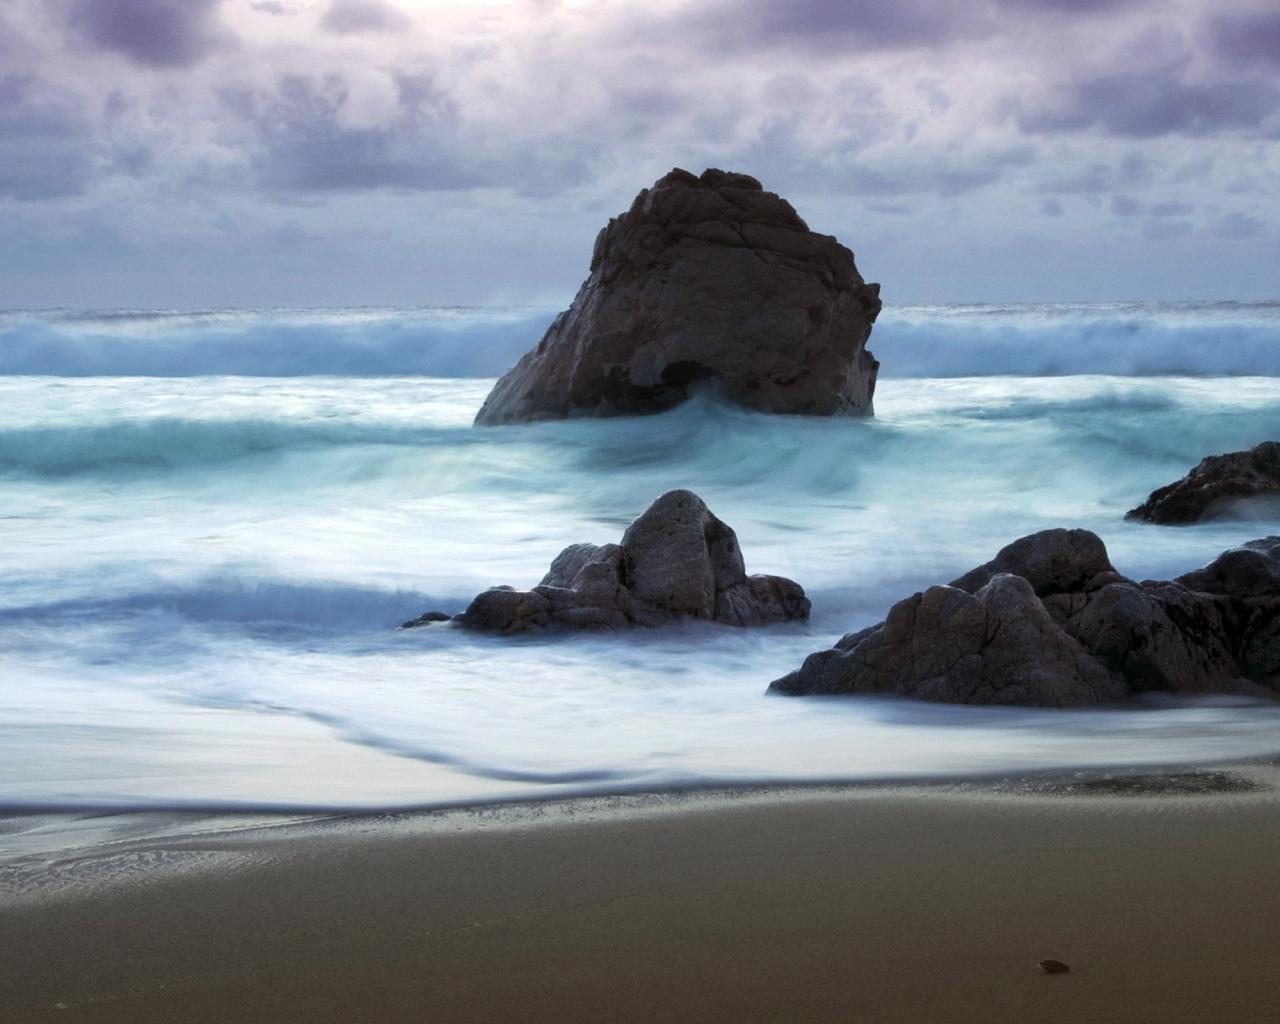 Playa con rocas gigantes - 1280x1024